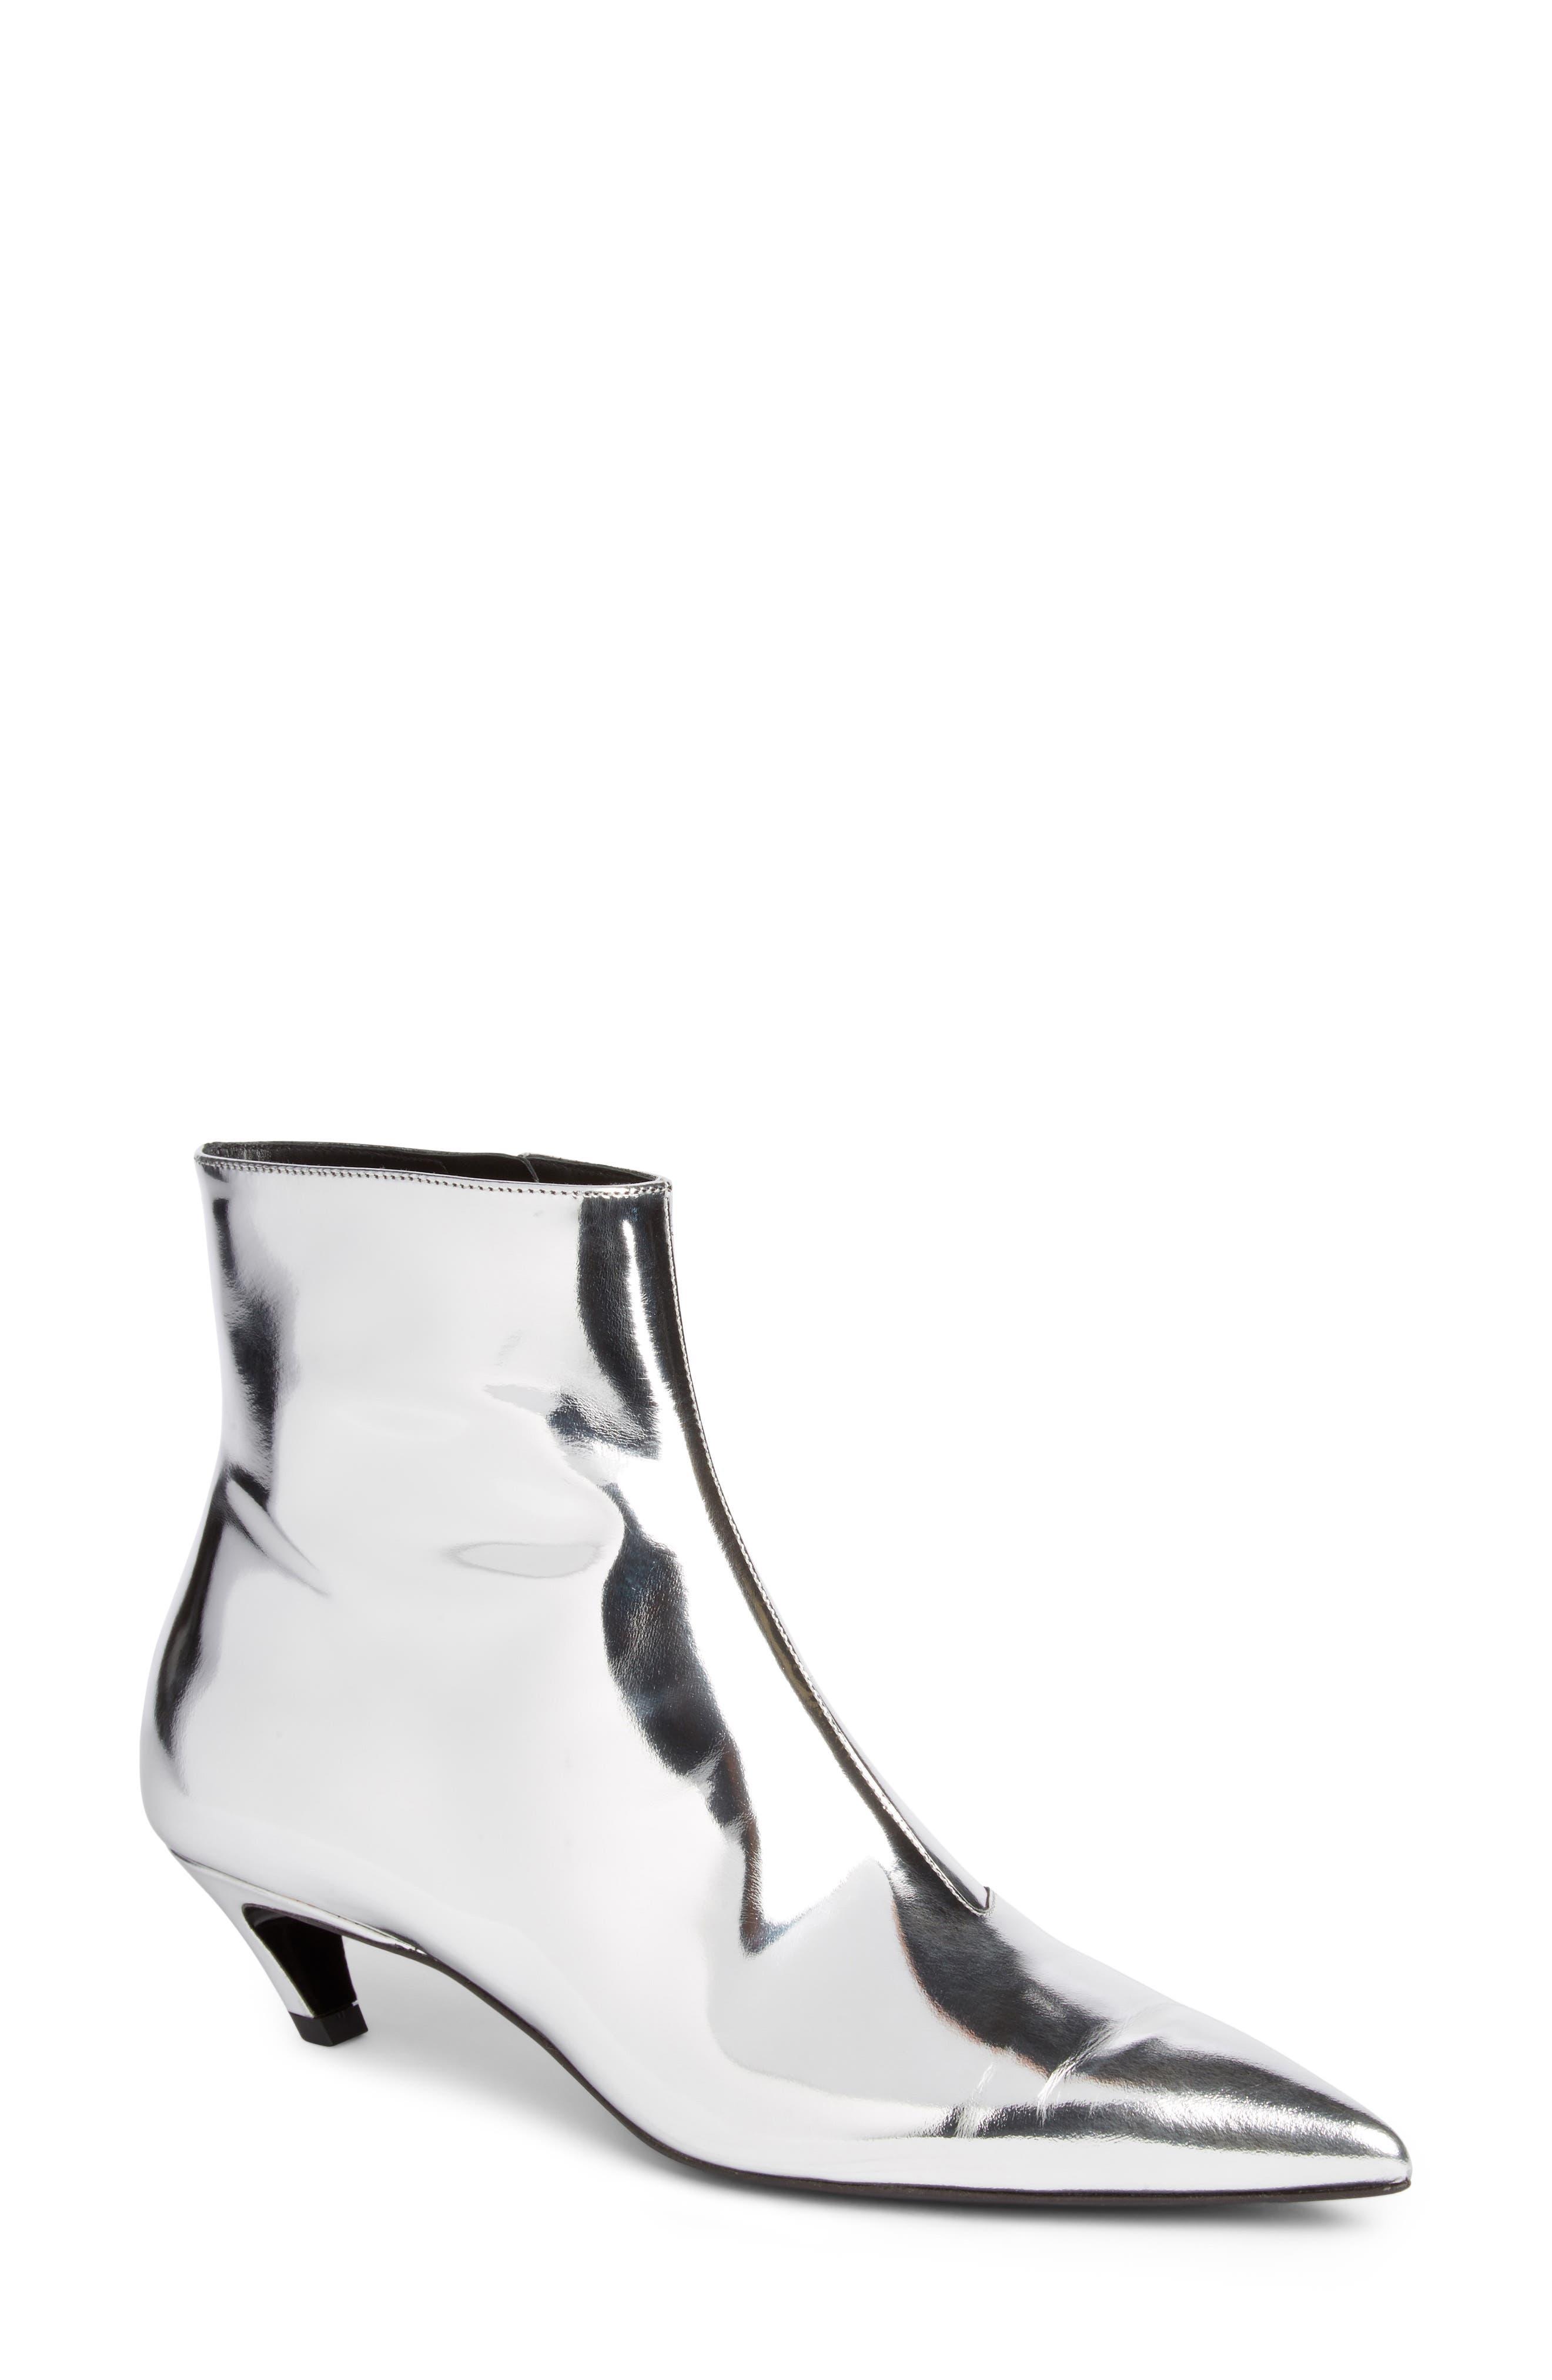 Balenciaga Metallic Pointy Toe Bootie (Women)